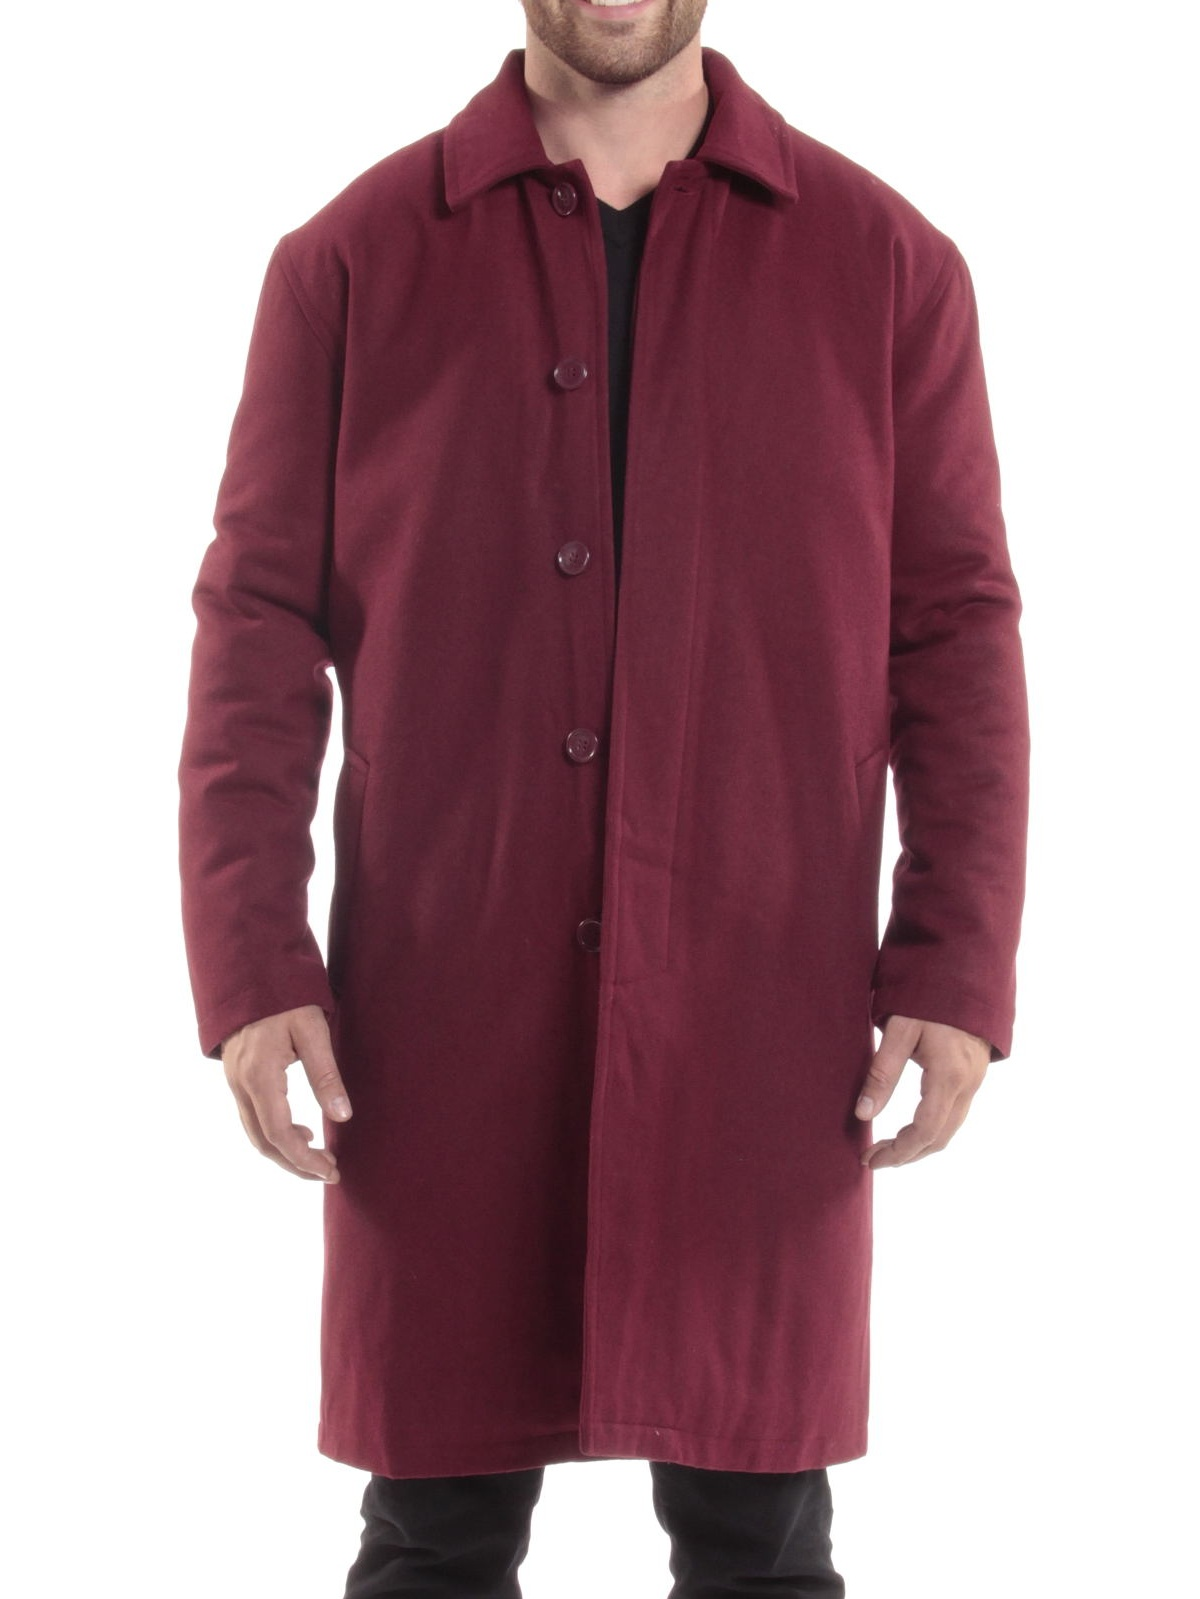 Alpine Swiss Men's Zach Knee Length Jacket Top Coat Trench Wool Blend...